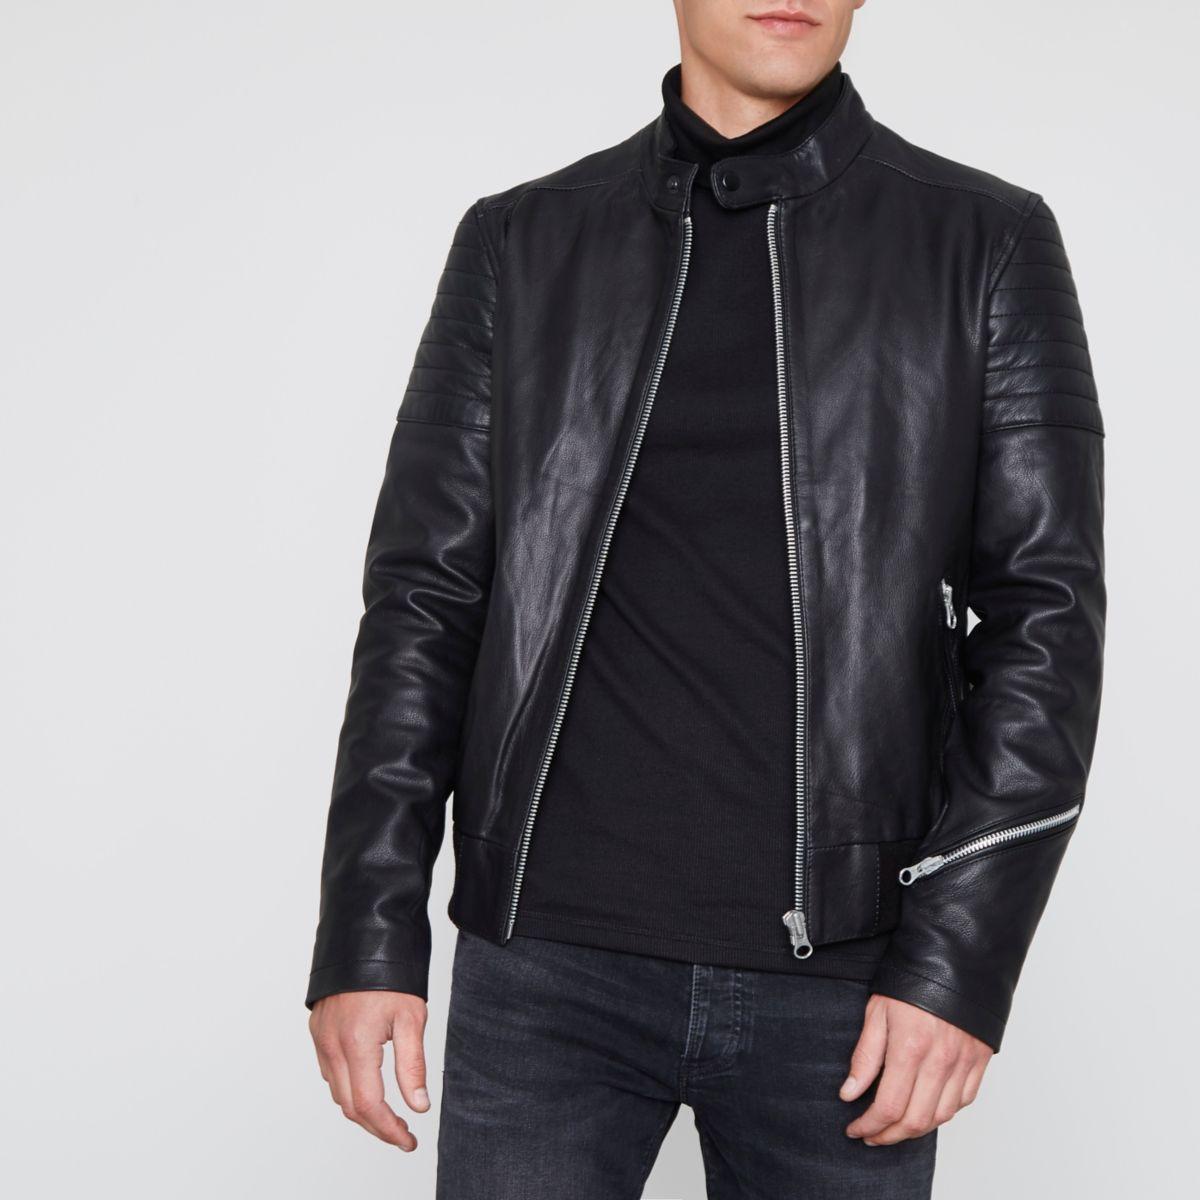 Black racer neck premium leather jacket